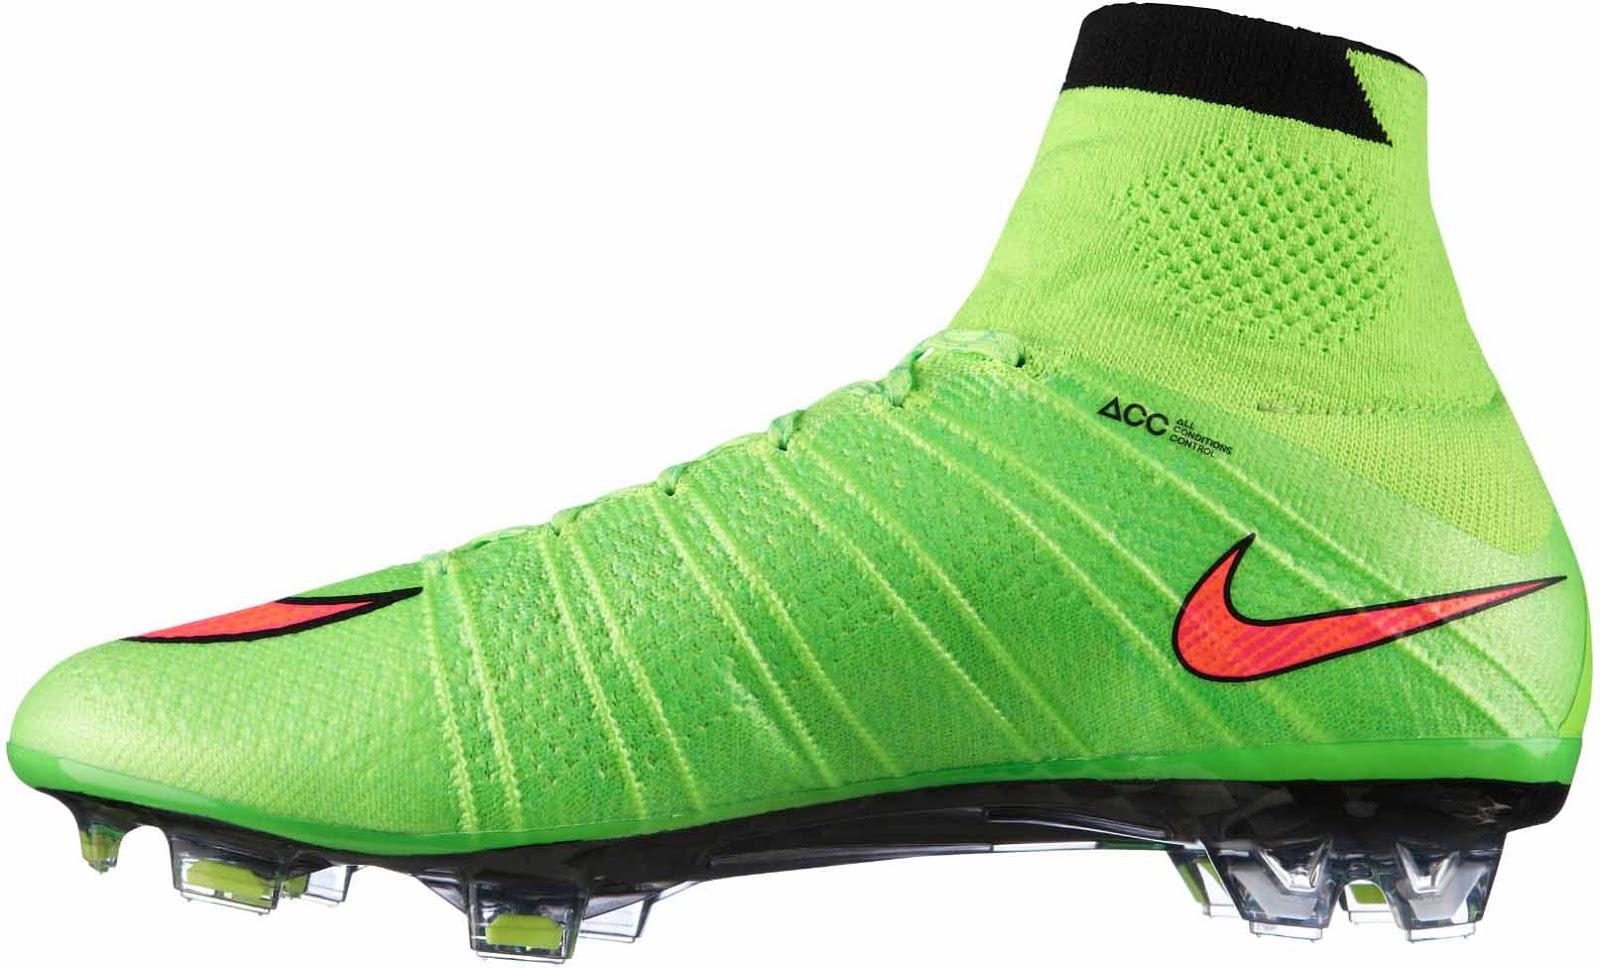 Green Nike Mercurial Superfly IV Cristiano Ronaldo 2014 ...  Green Nike Merc...